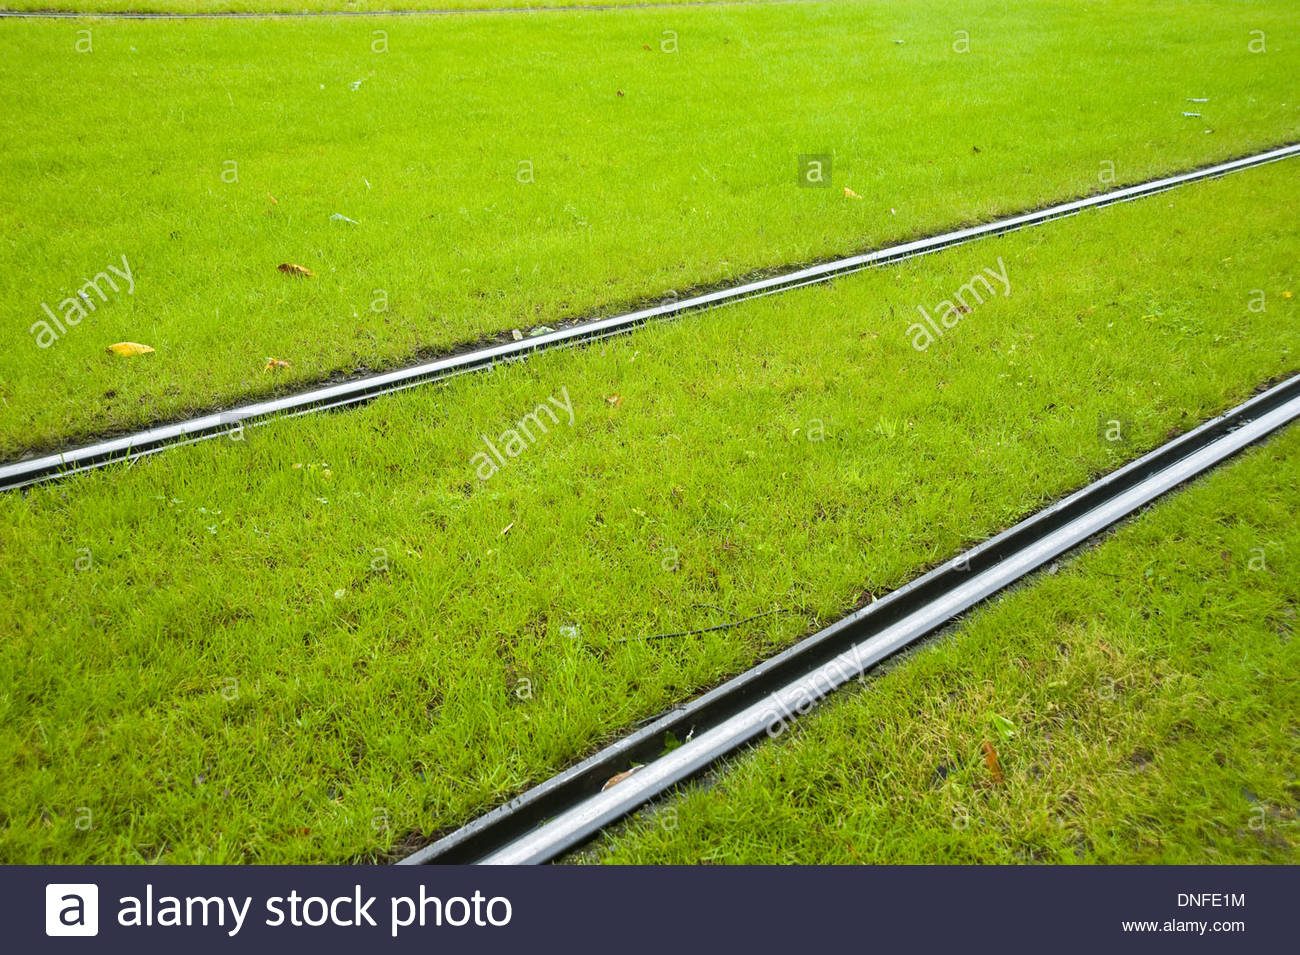 Strasbourg, Tramway, Rasengleis, Lawn Track - Stock Image